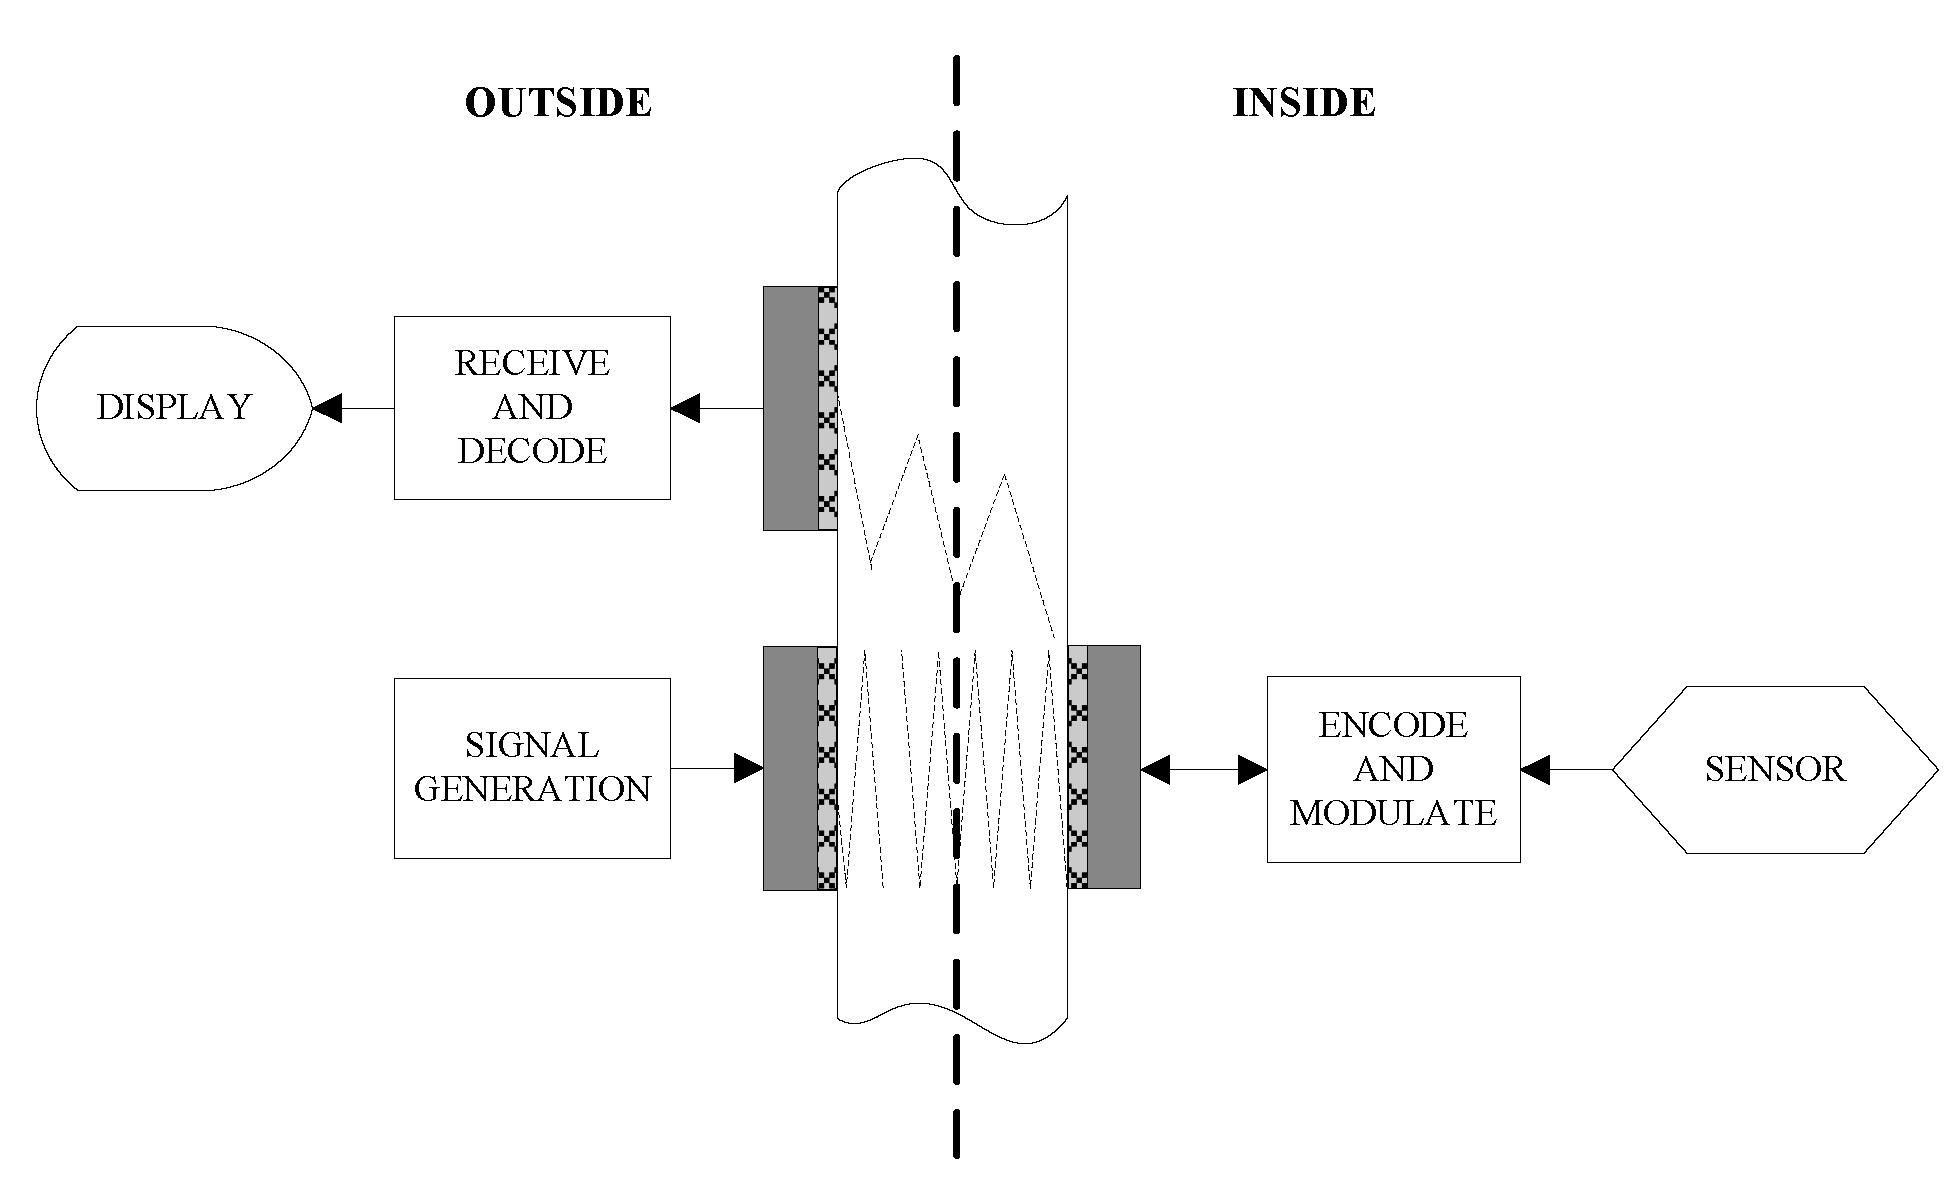 2002 Gmc Yukon Radio Controls Wiring Diagram 2007 GMC